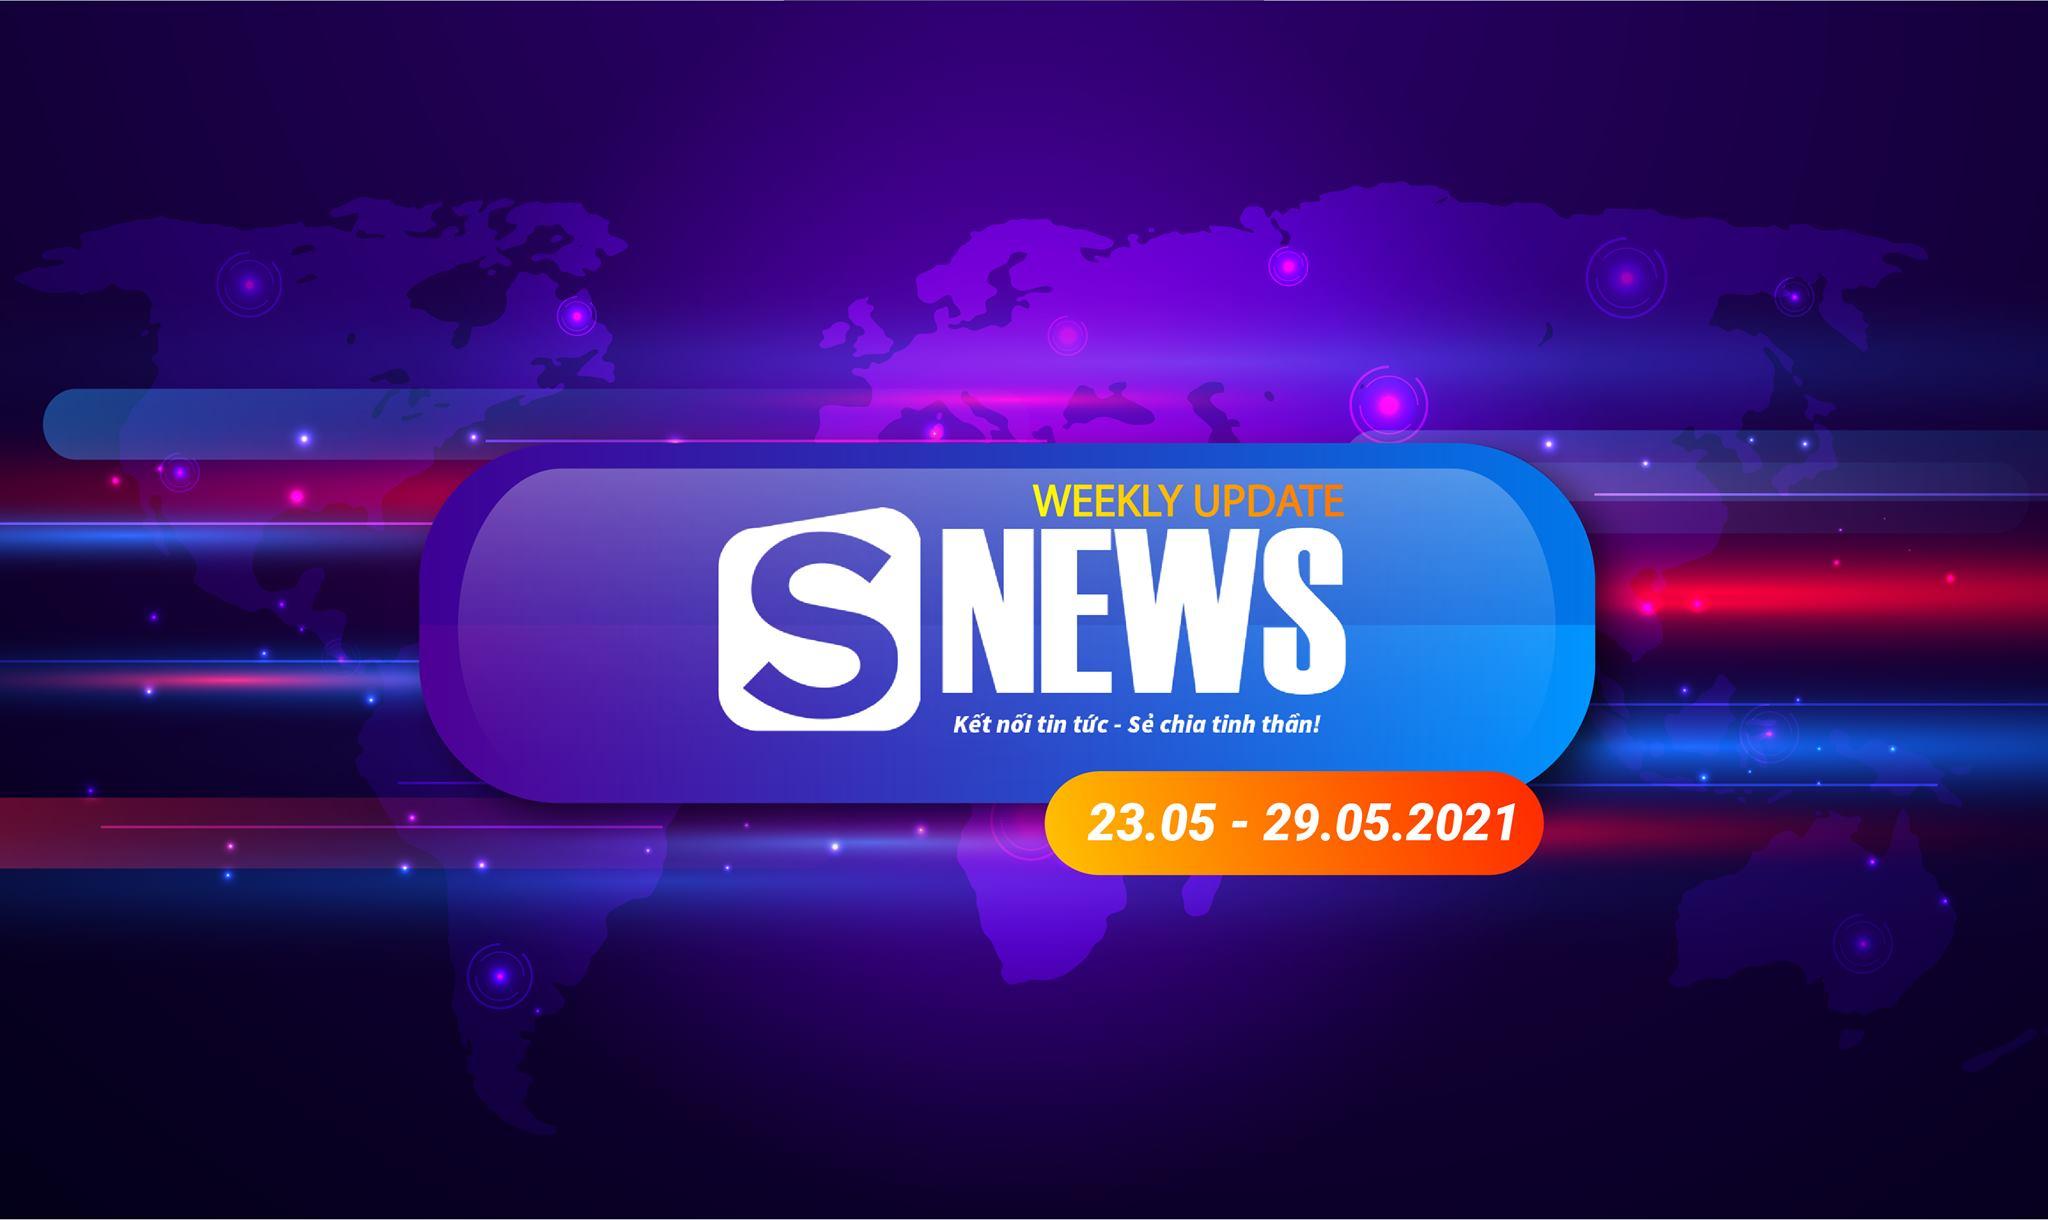 Tổng hợp tin tức Sapo tuần qua: 23.05.2021 - 29.05.2021